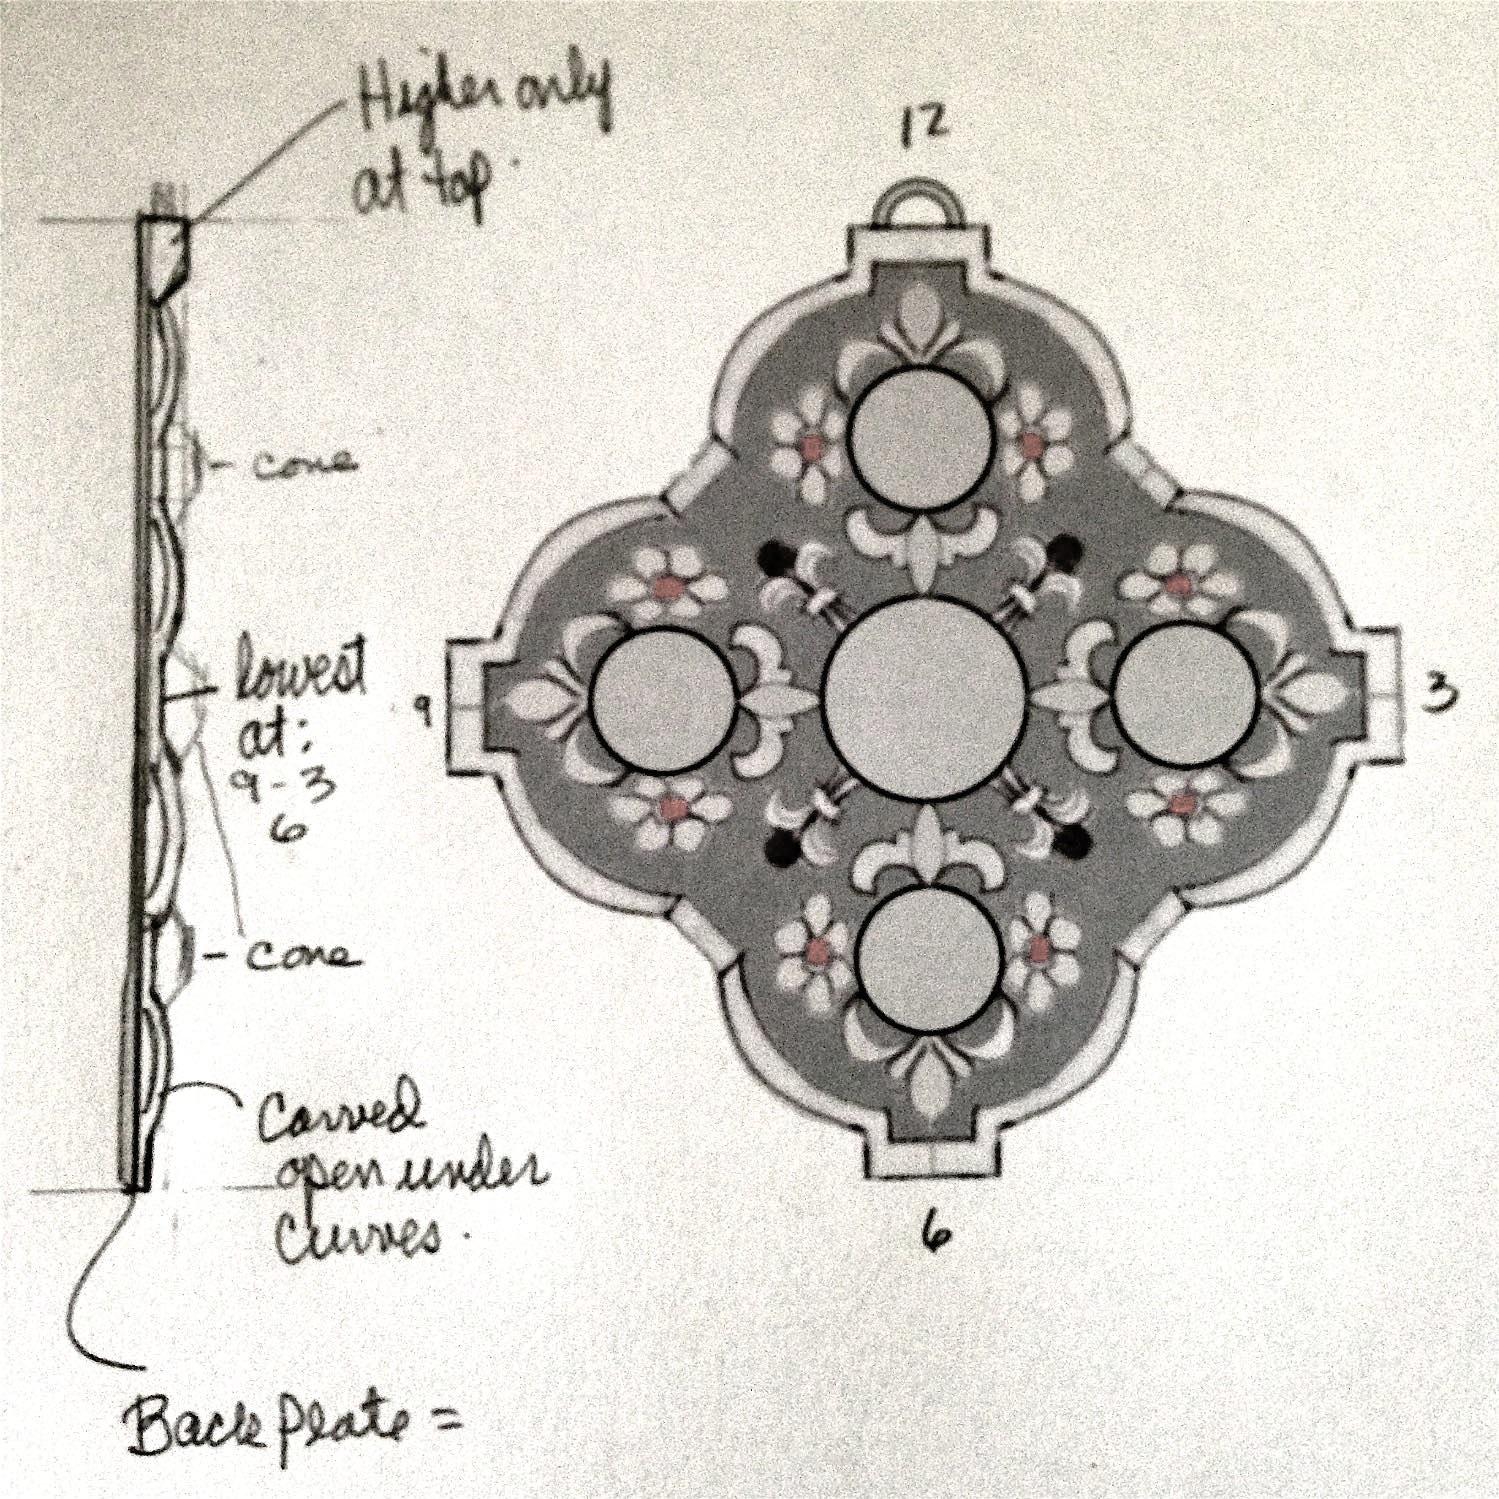 Greta Garbo's design development for depth of design